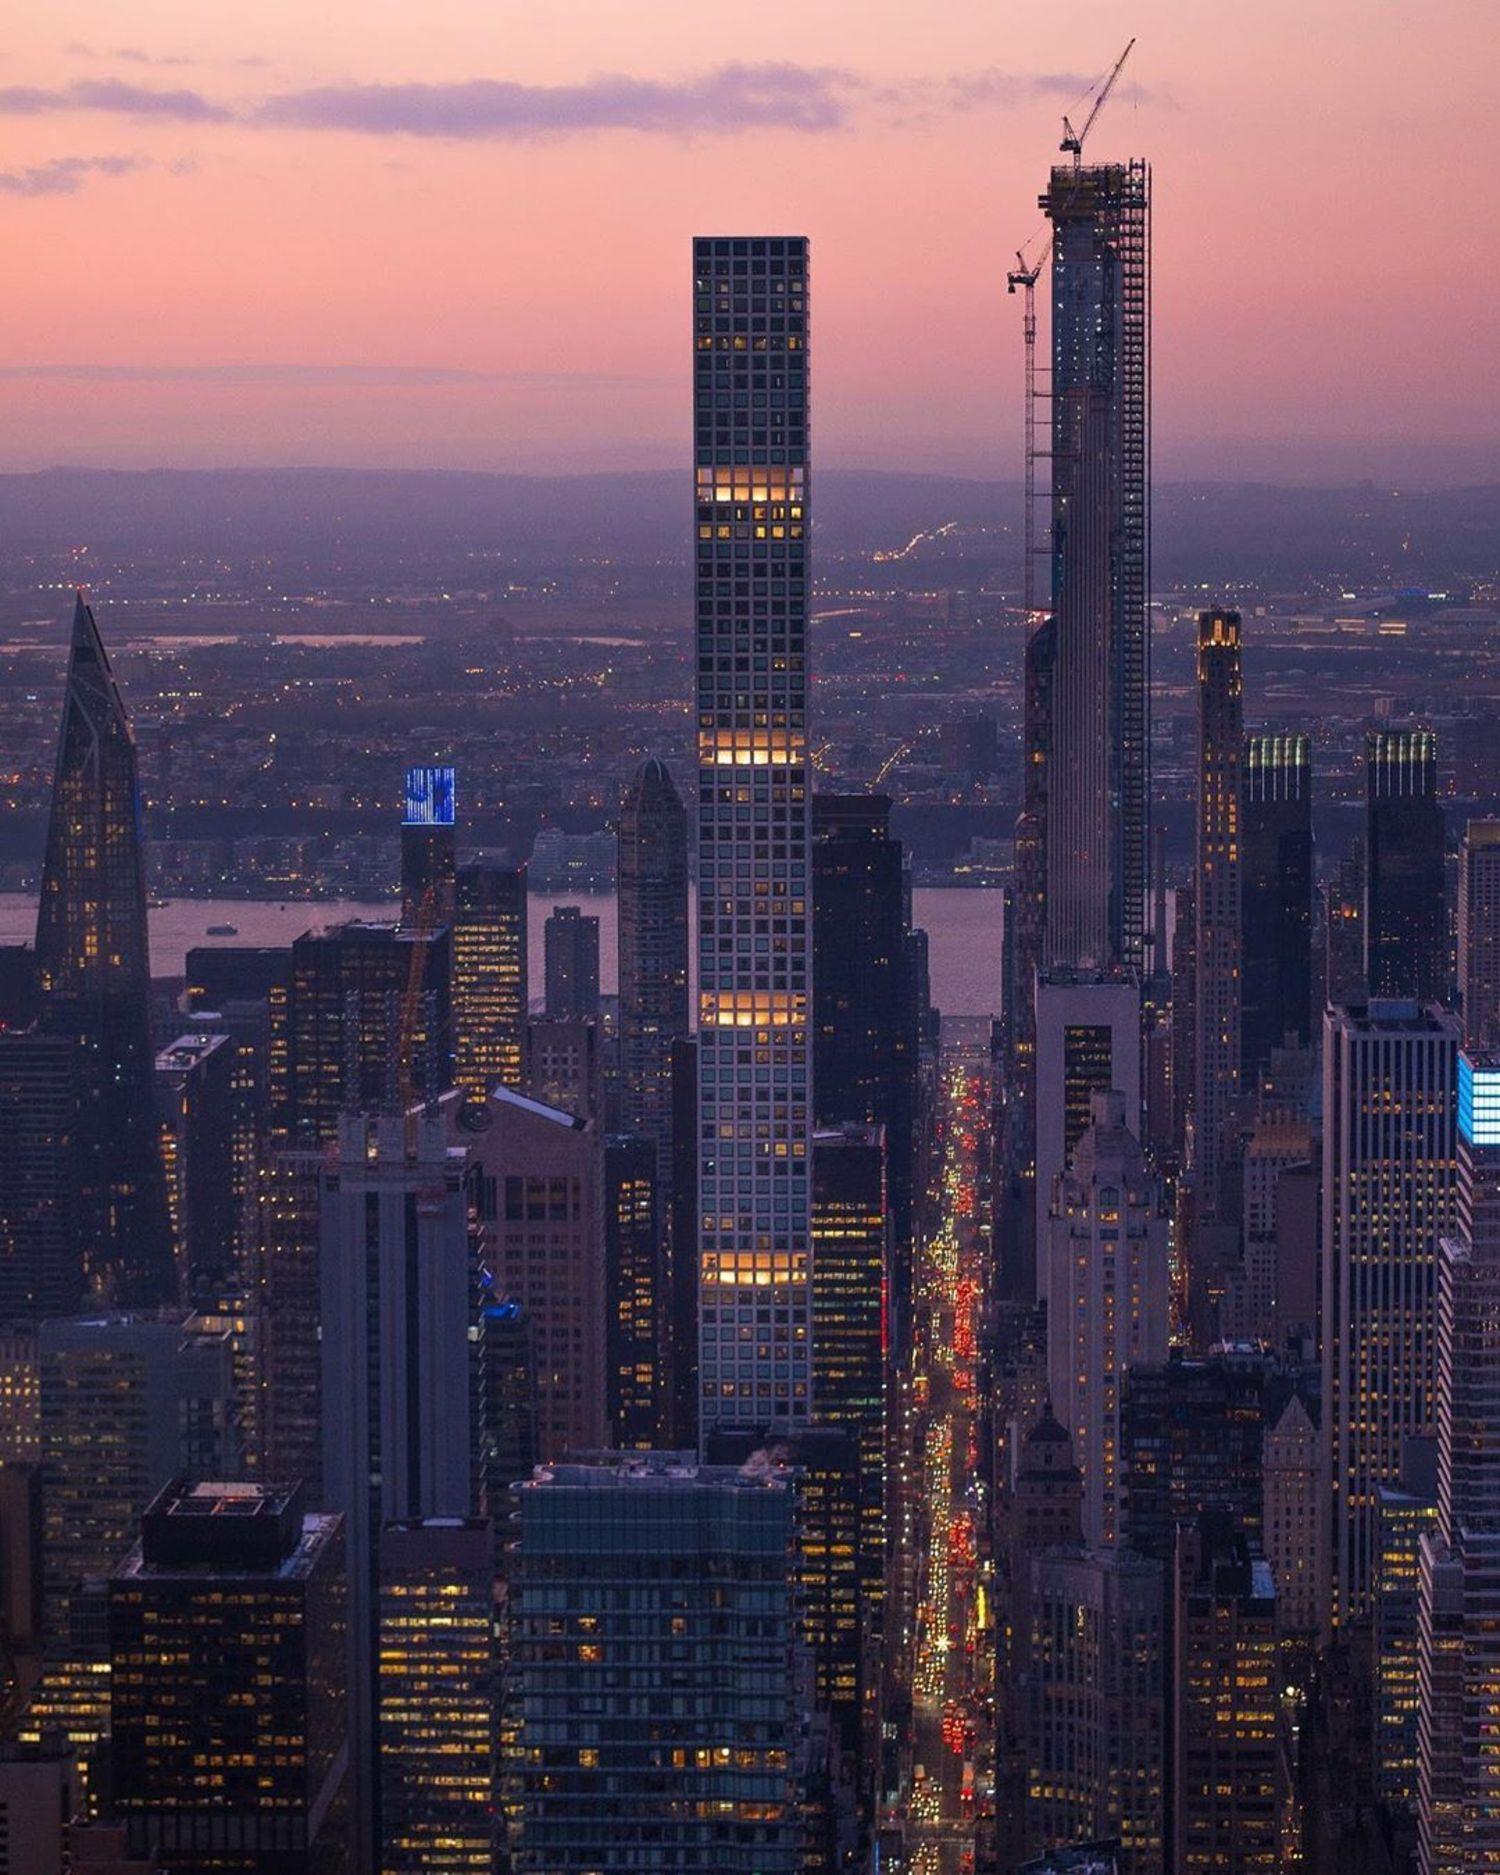 Billionaire's Row, 57th Street, Midtown, Manhattan